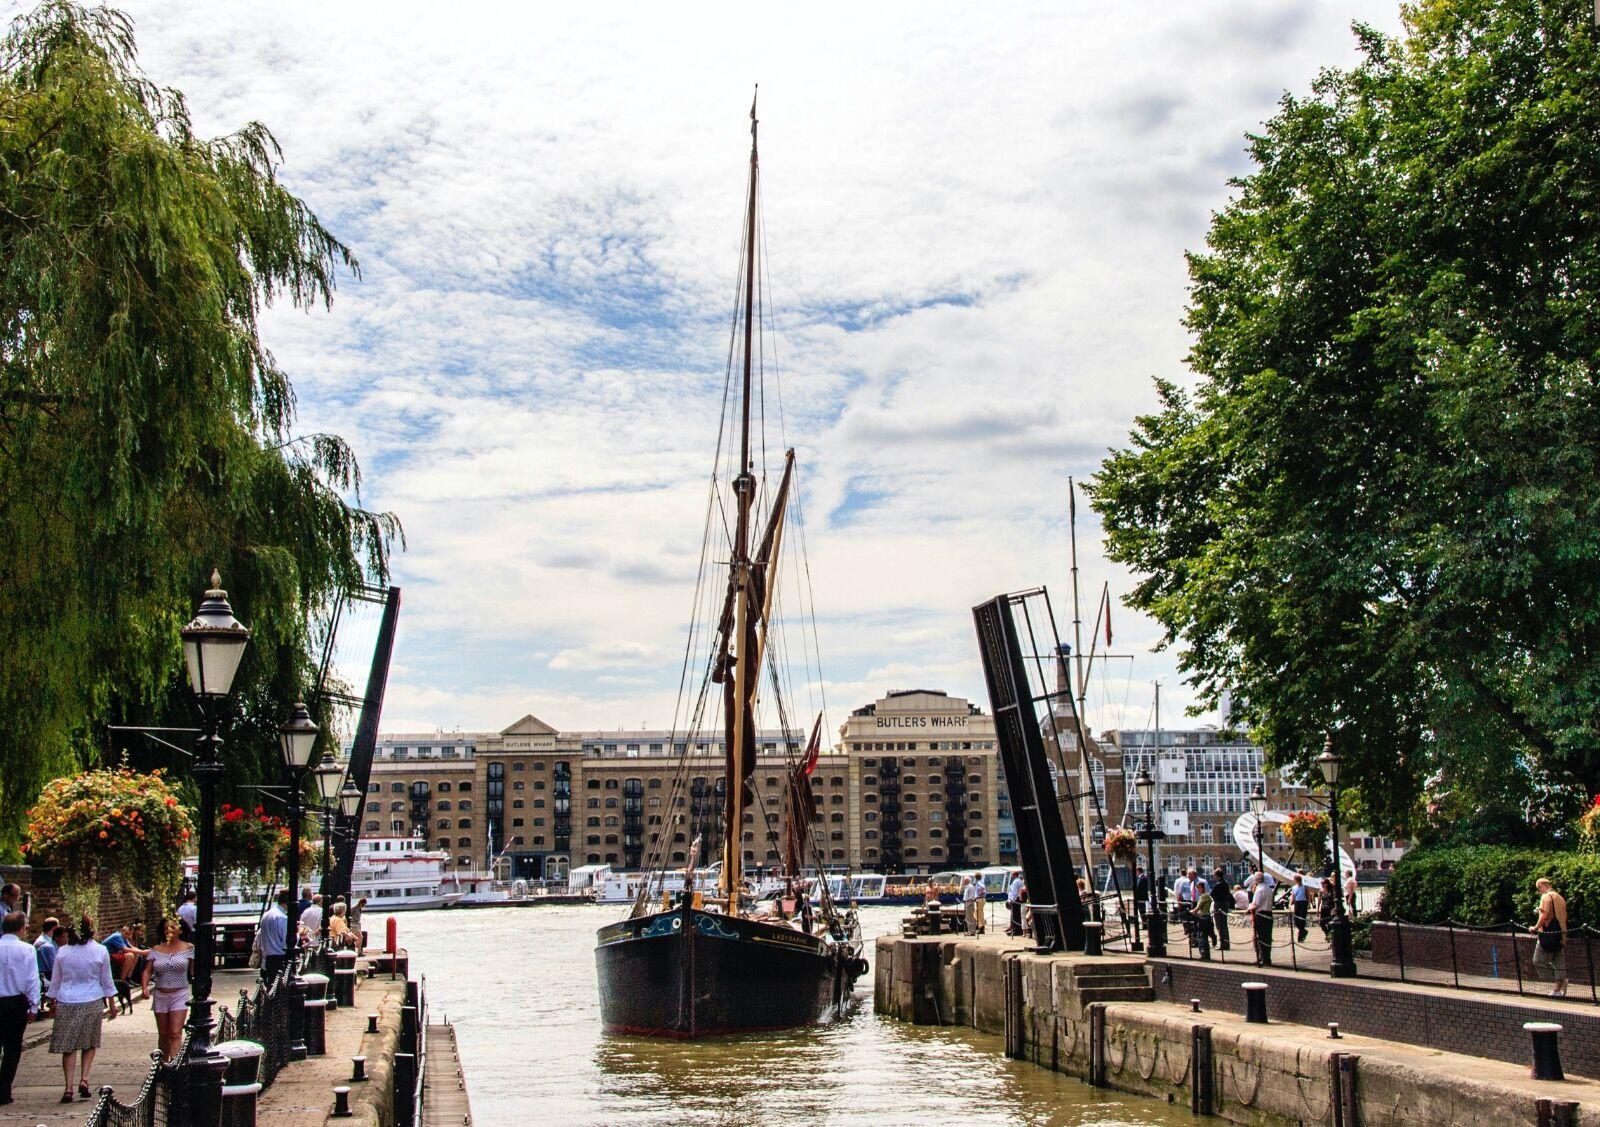 Katherine's Dock